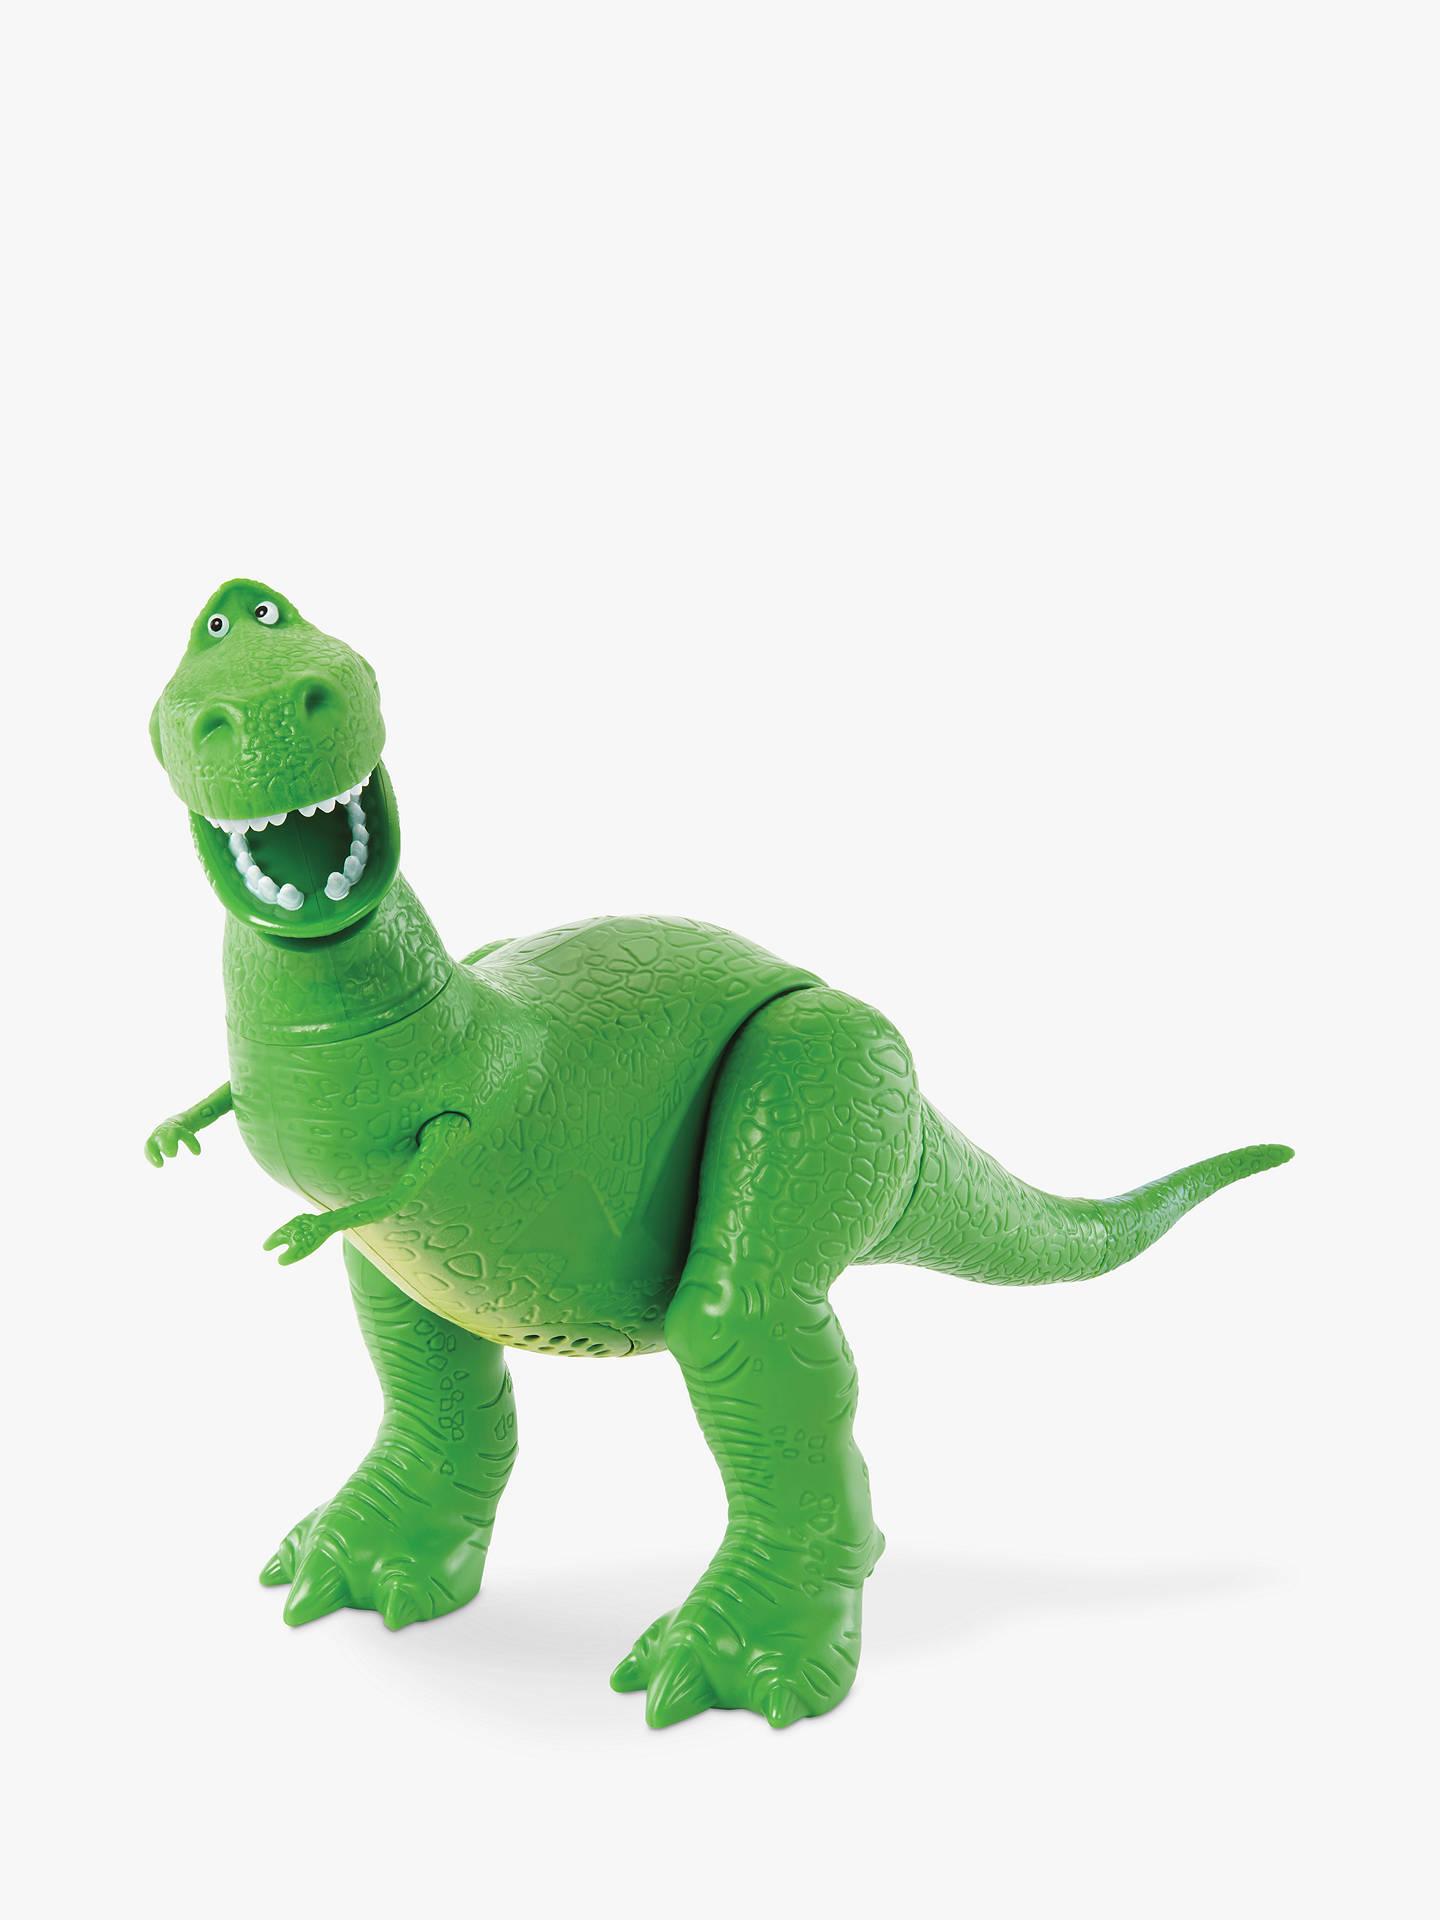 Disney Pixar Toy Story Rex Cushion Dinosaurs Children Green